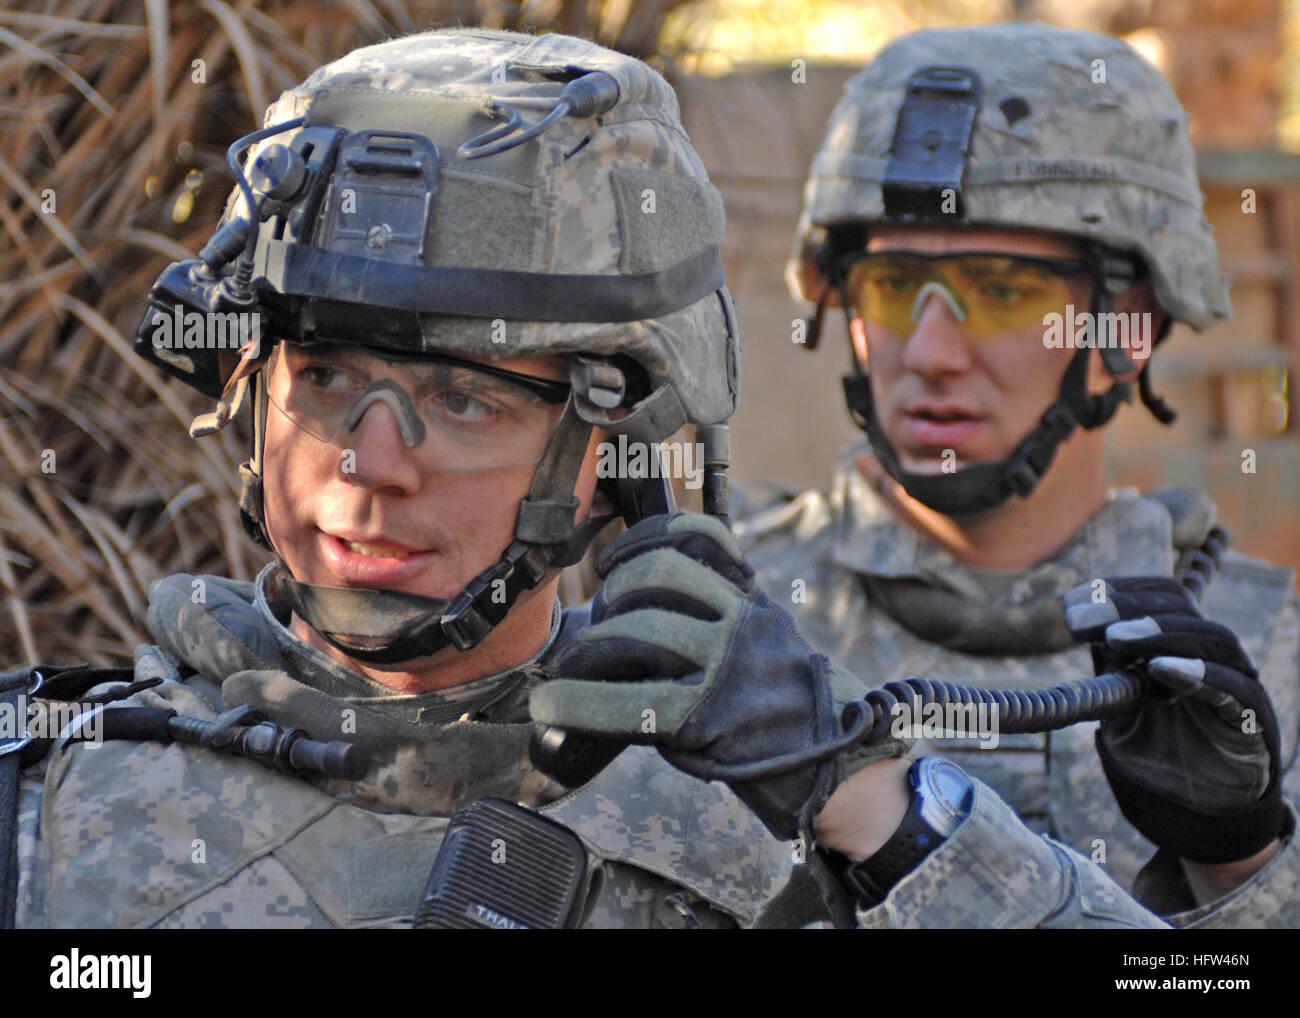 071209-N-1132M-029 BAQUBAH, Iraq (Dec. 9, 2007) U.S. Army Maj. Michael Williams, with 2nd Platoon, Able Company, - Stock Image